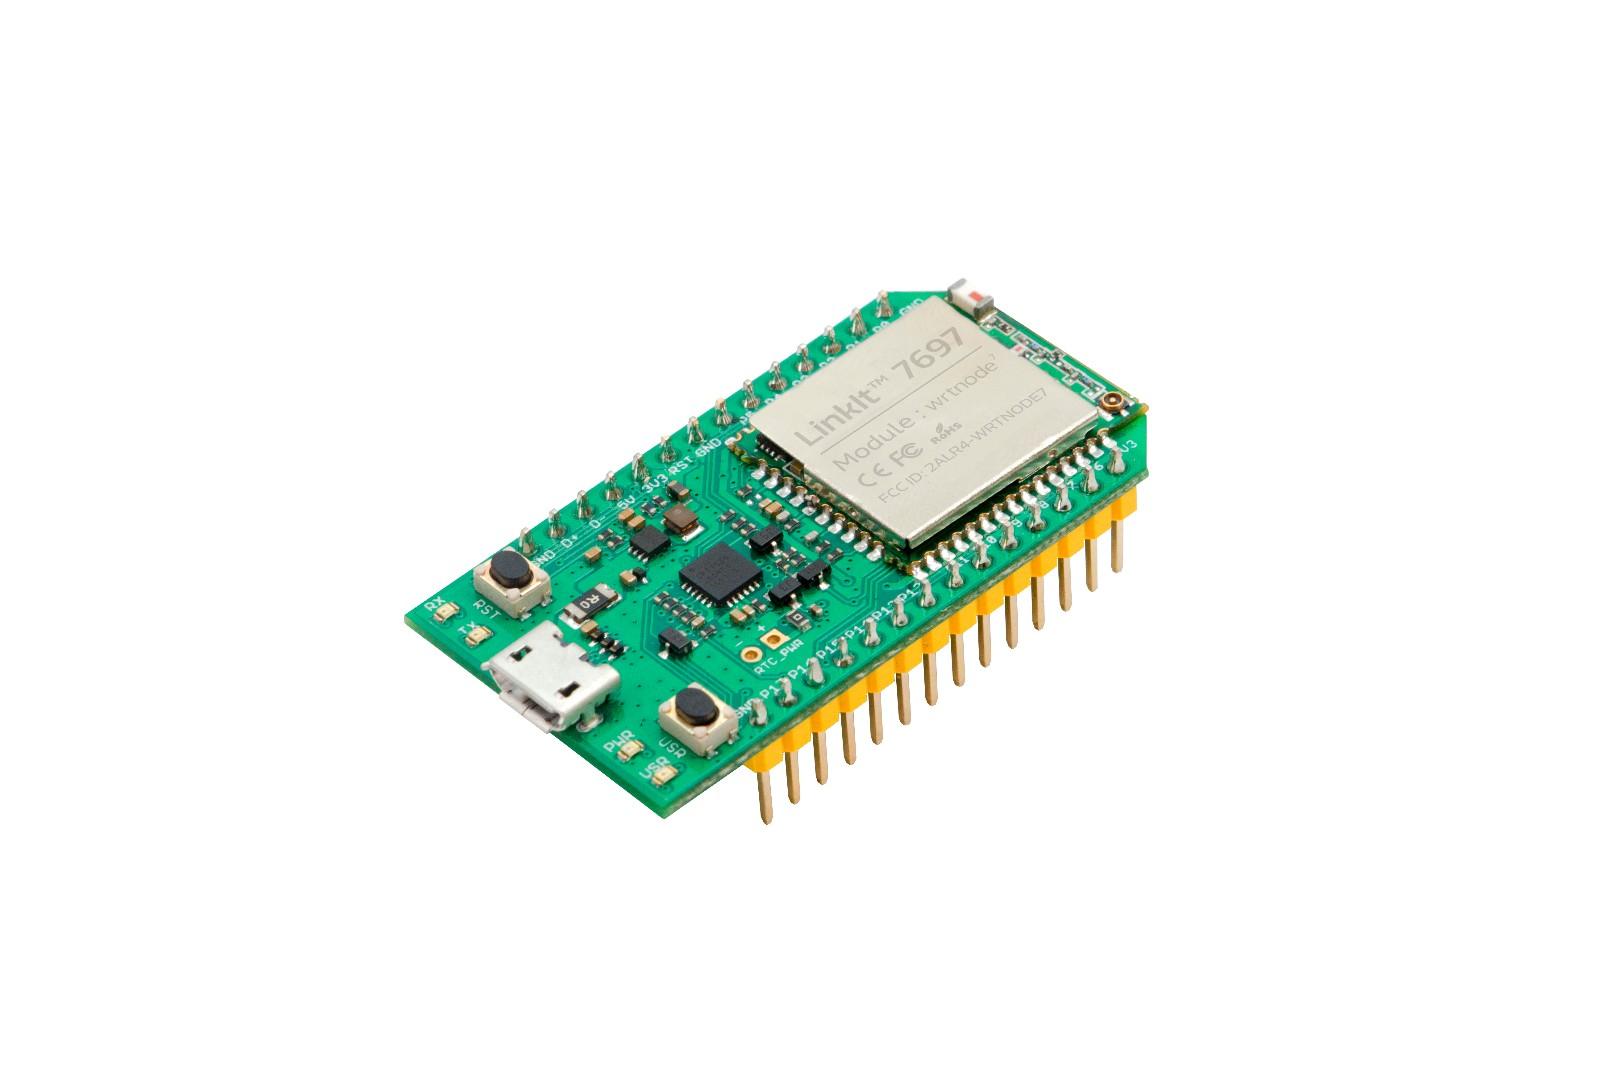 LinkIt 7697 (Lightweight IoT Board)